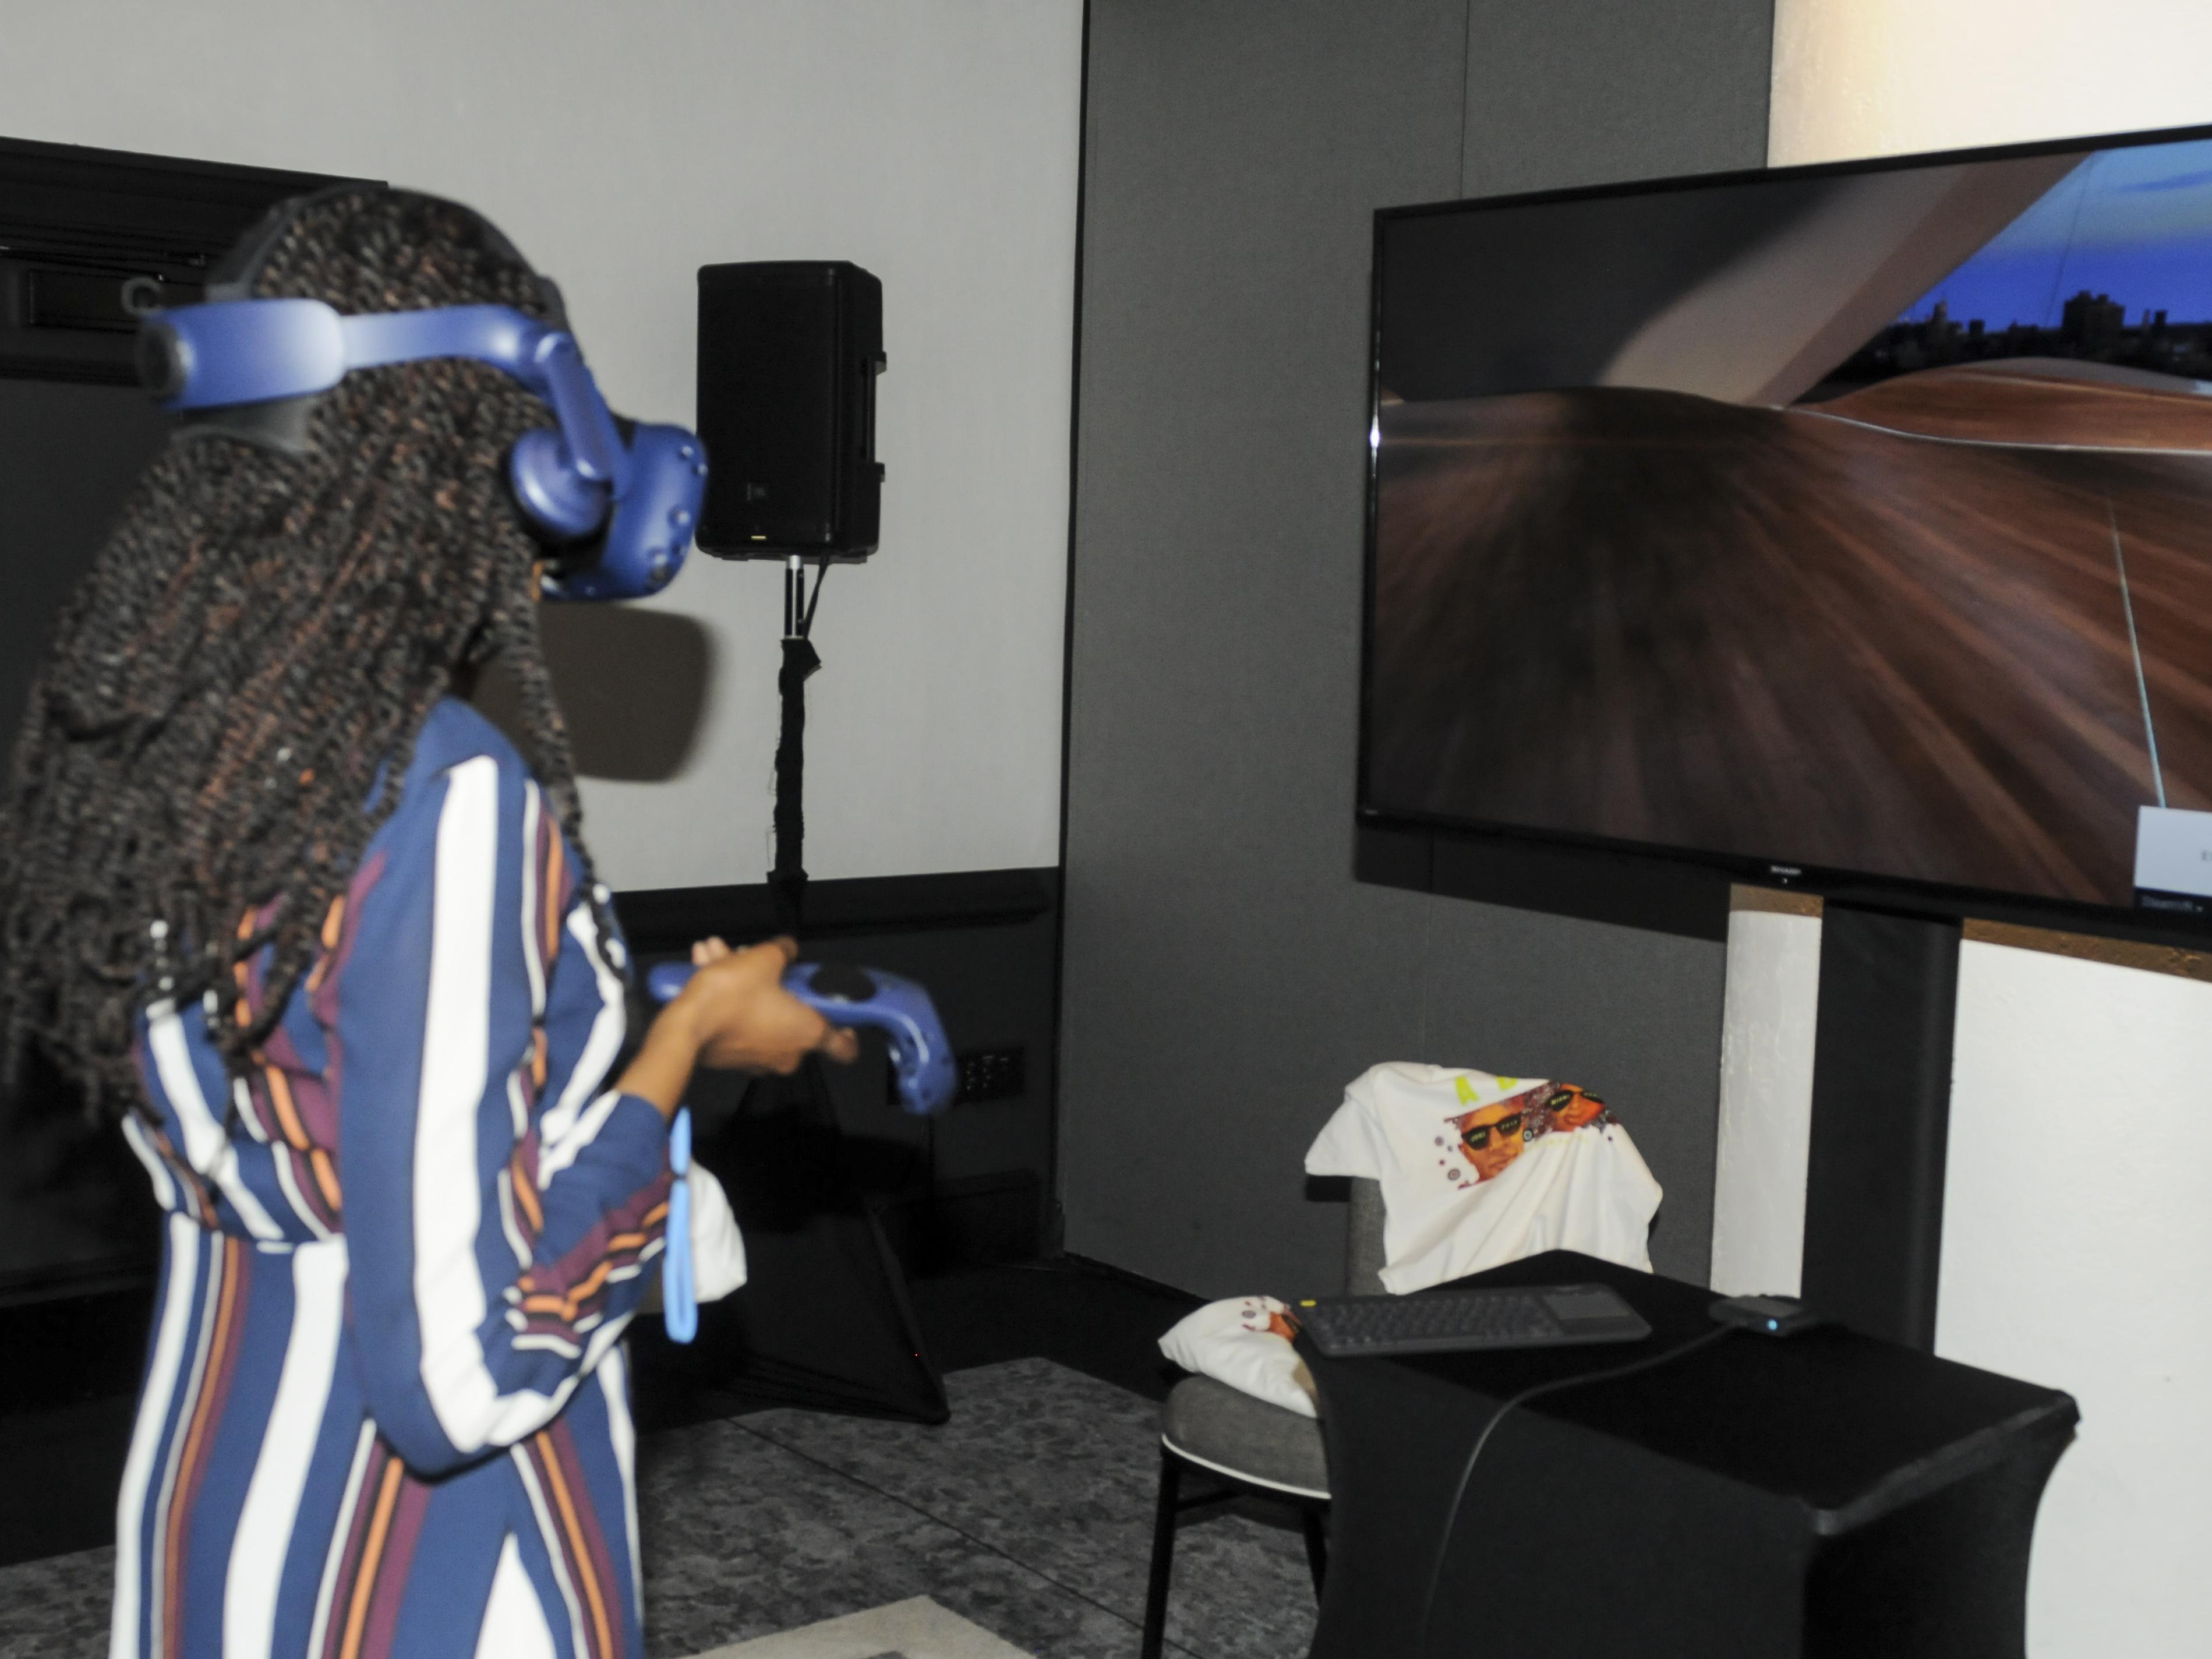 CADILLAC VR LOUNGE